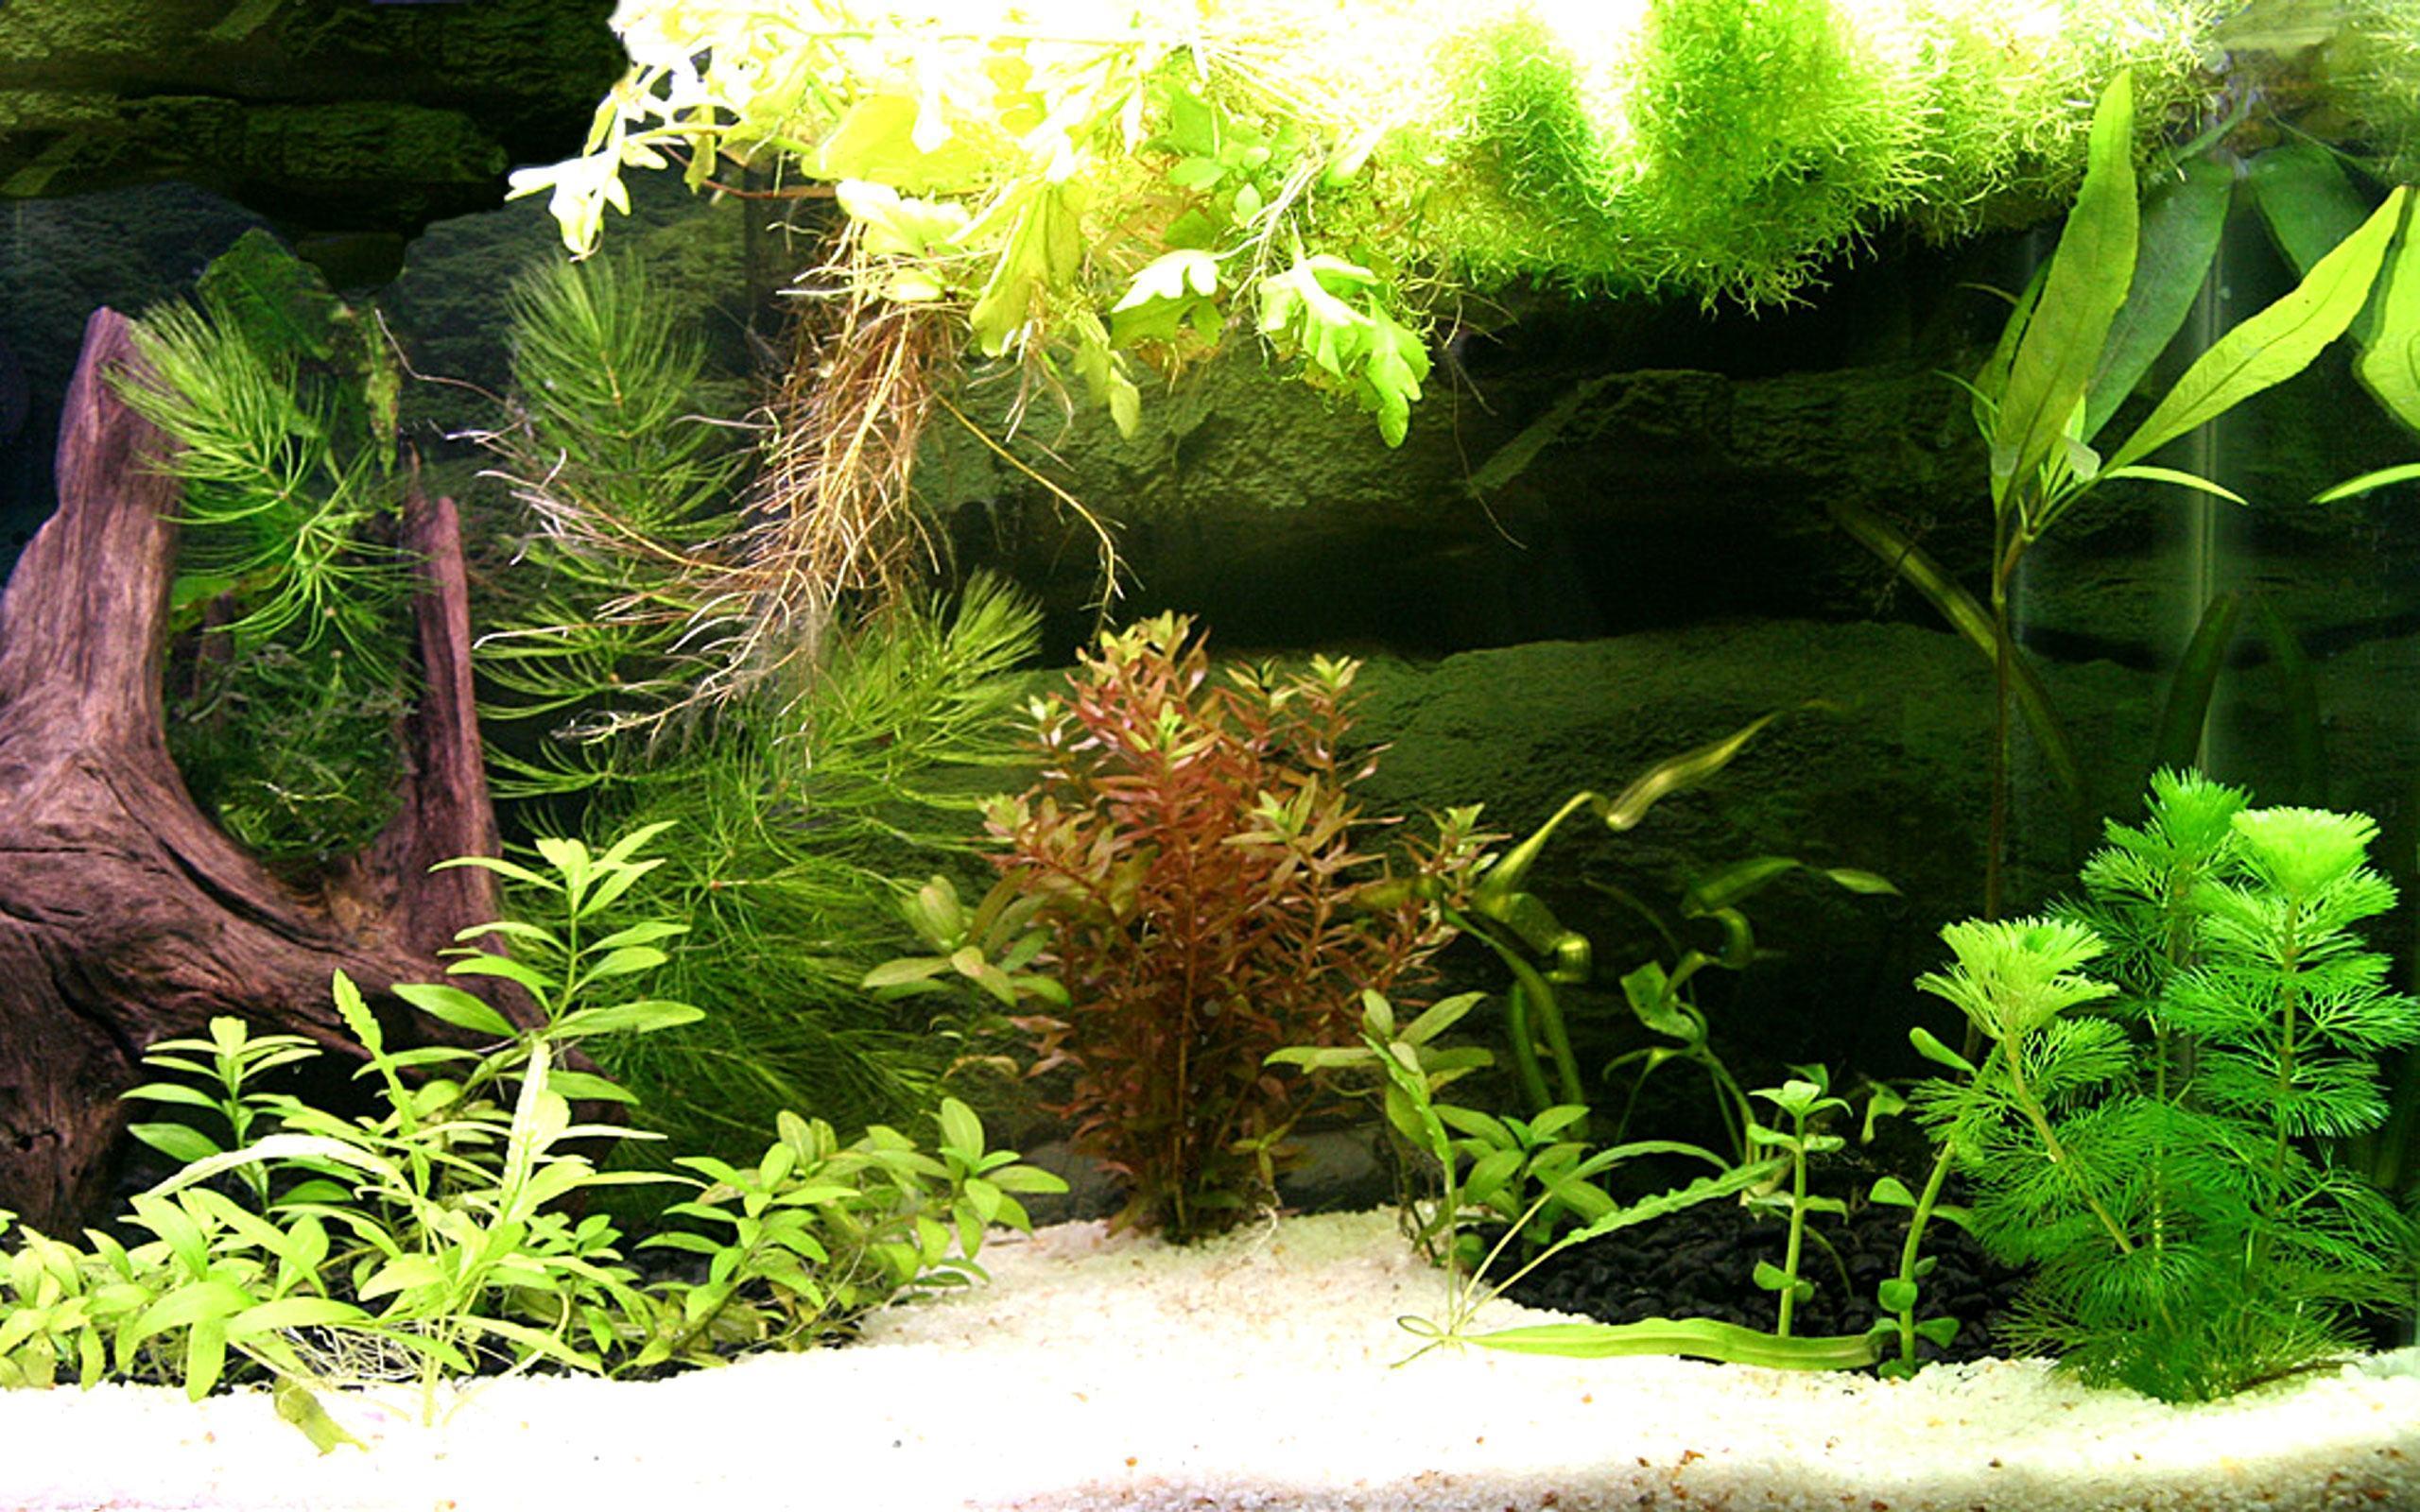 aquarium backgrounds pictures wallpaper cave. Black Bedroom Furniture Sets. Home Design Ideas